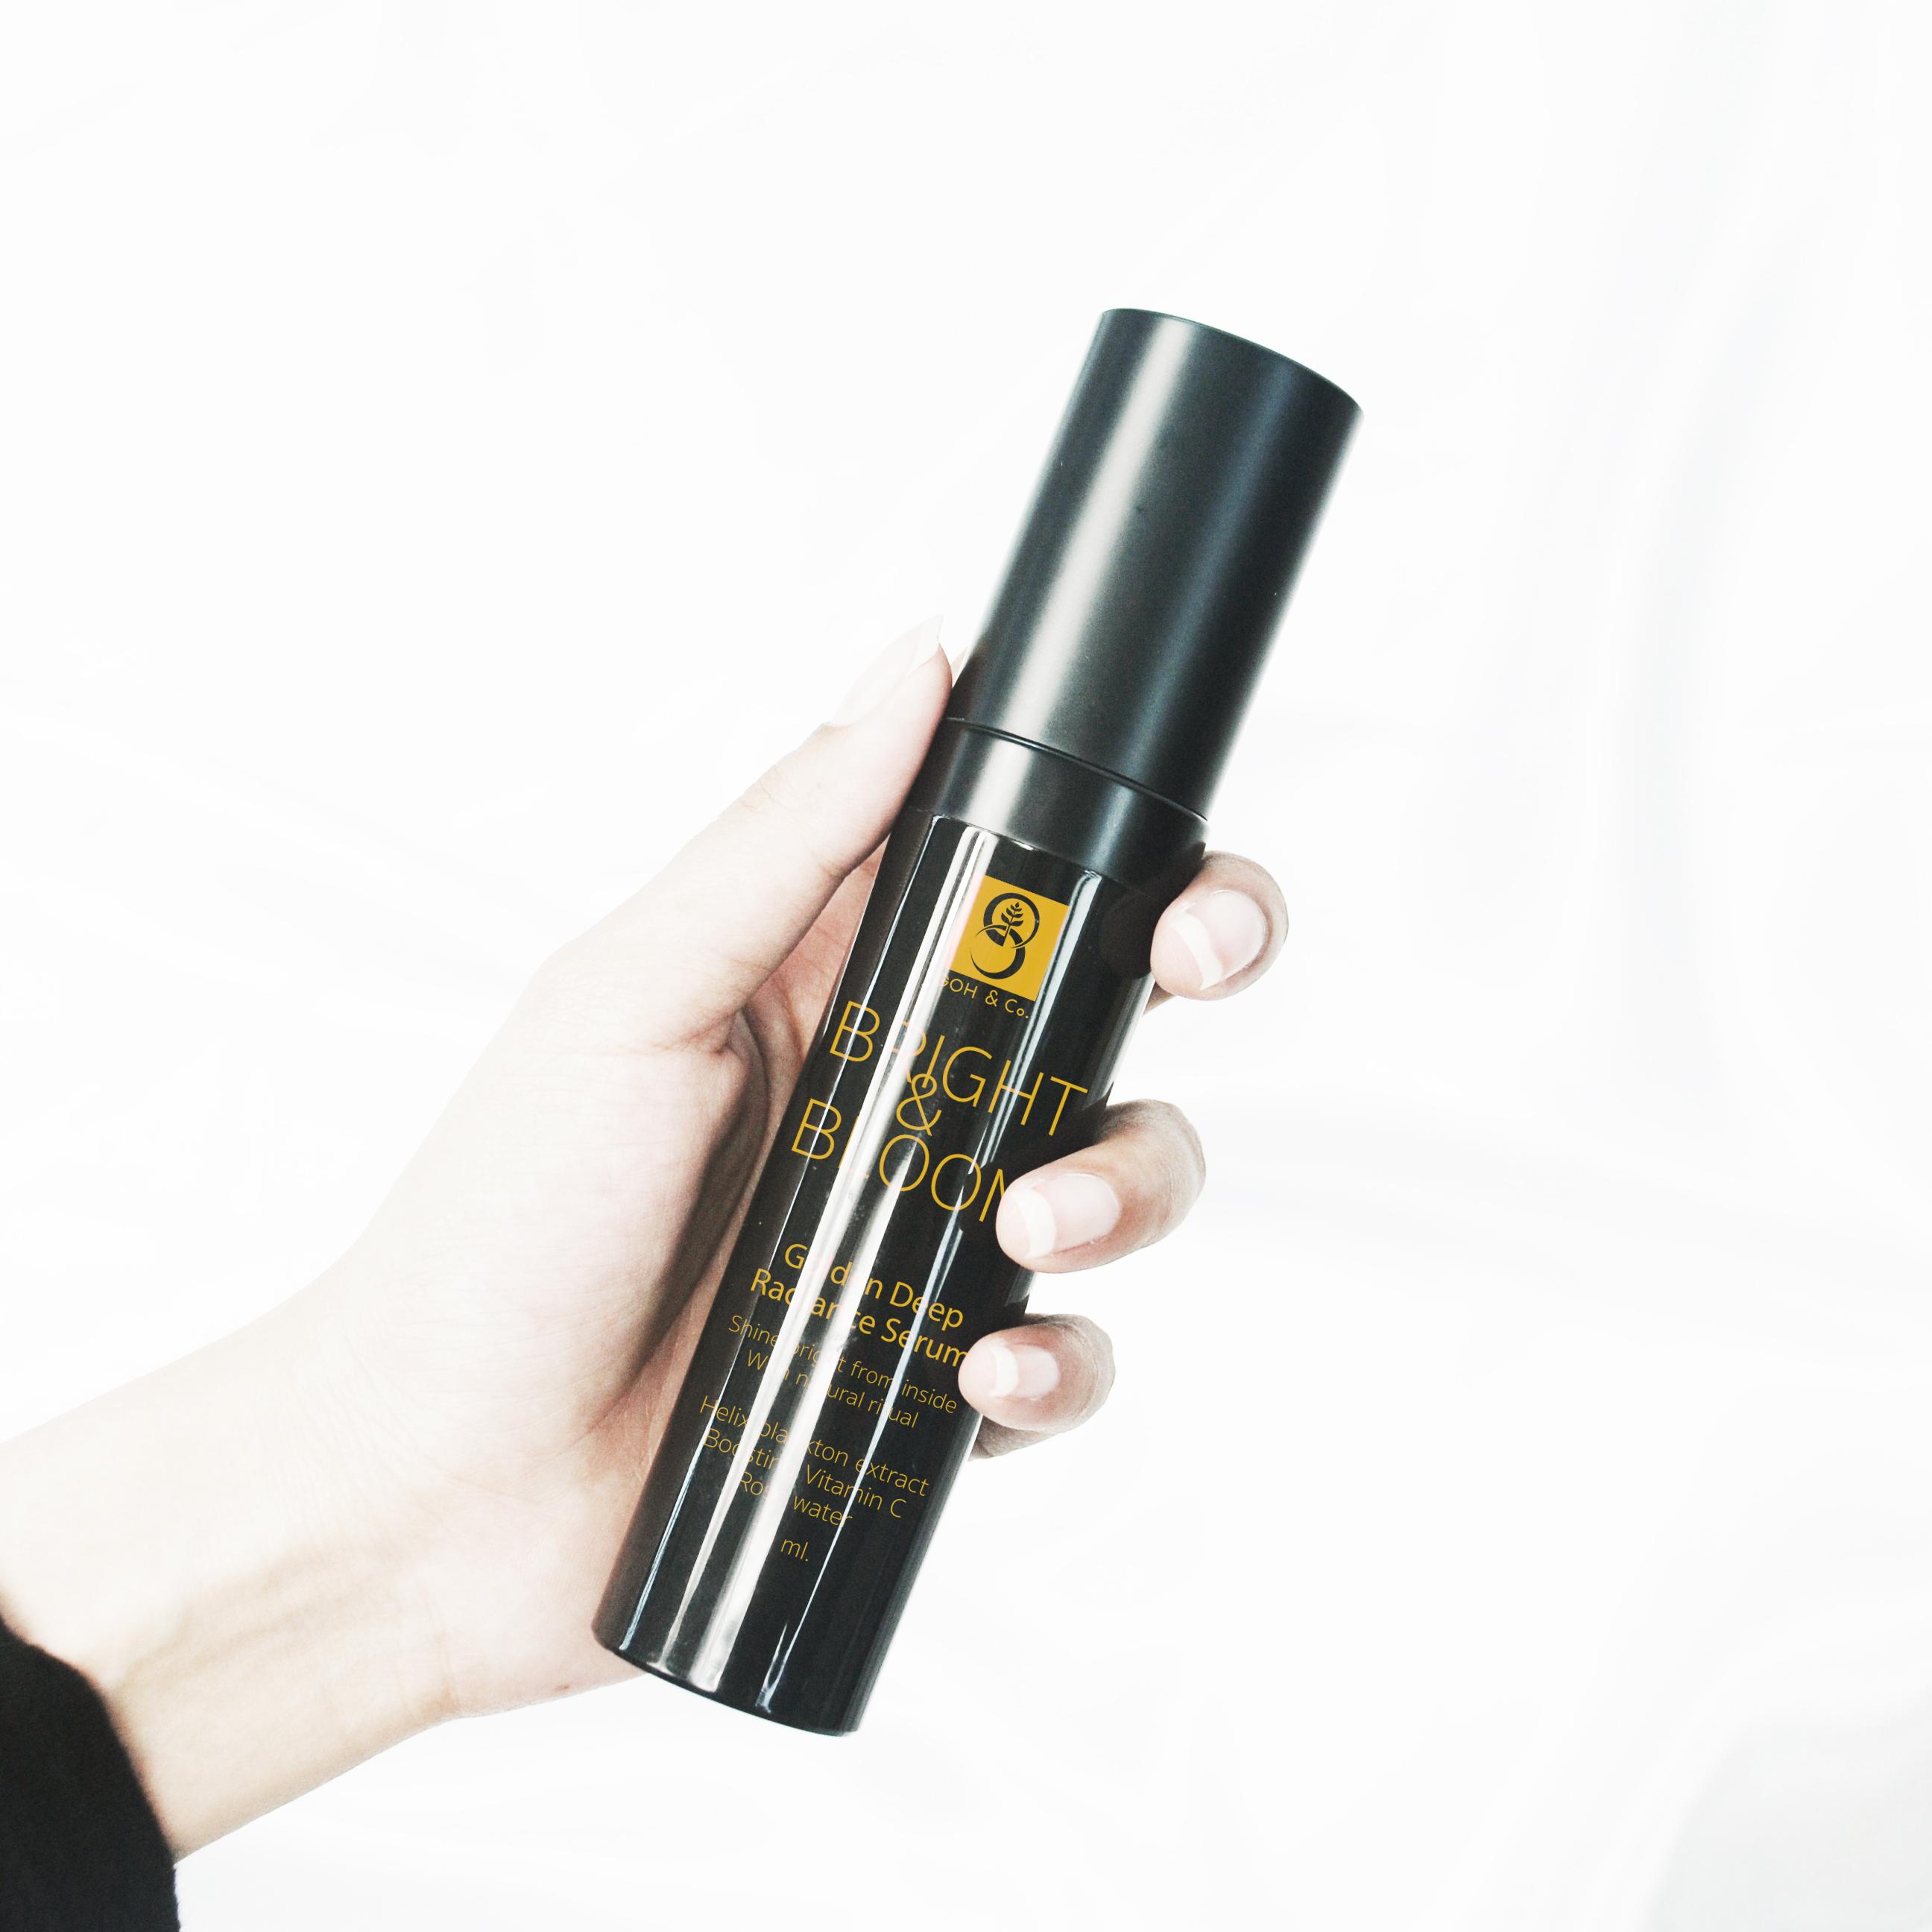 GOH&Co Golden deep radiance serum